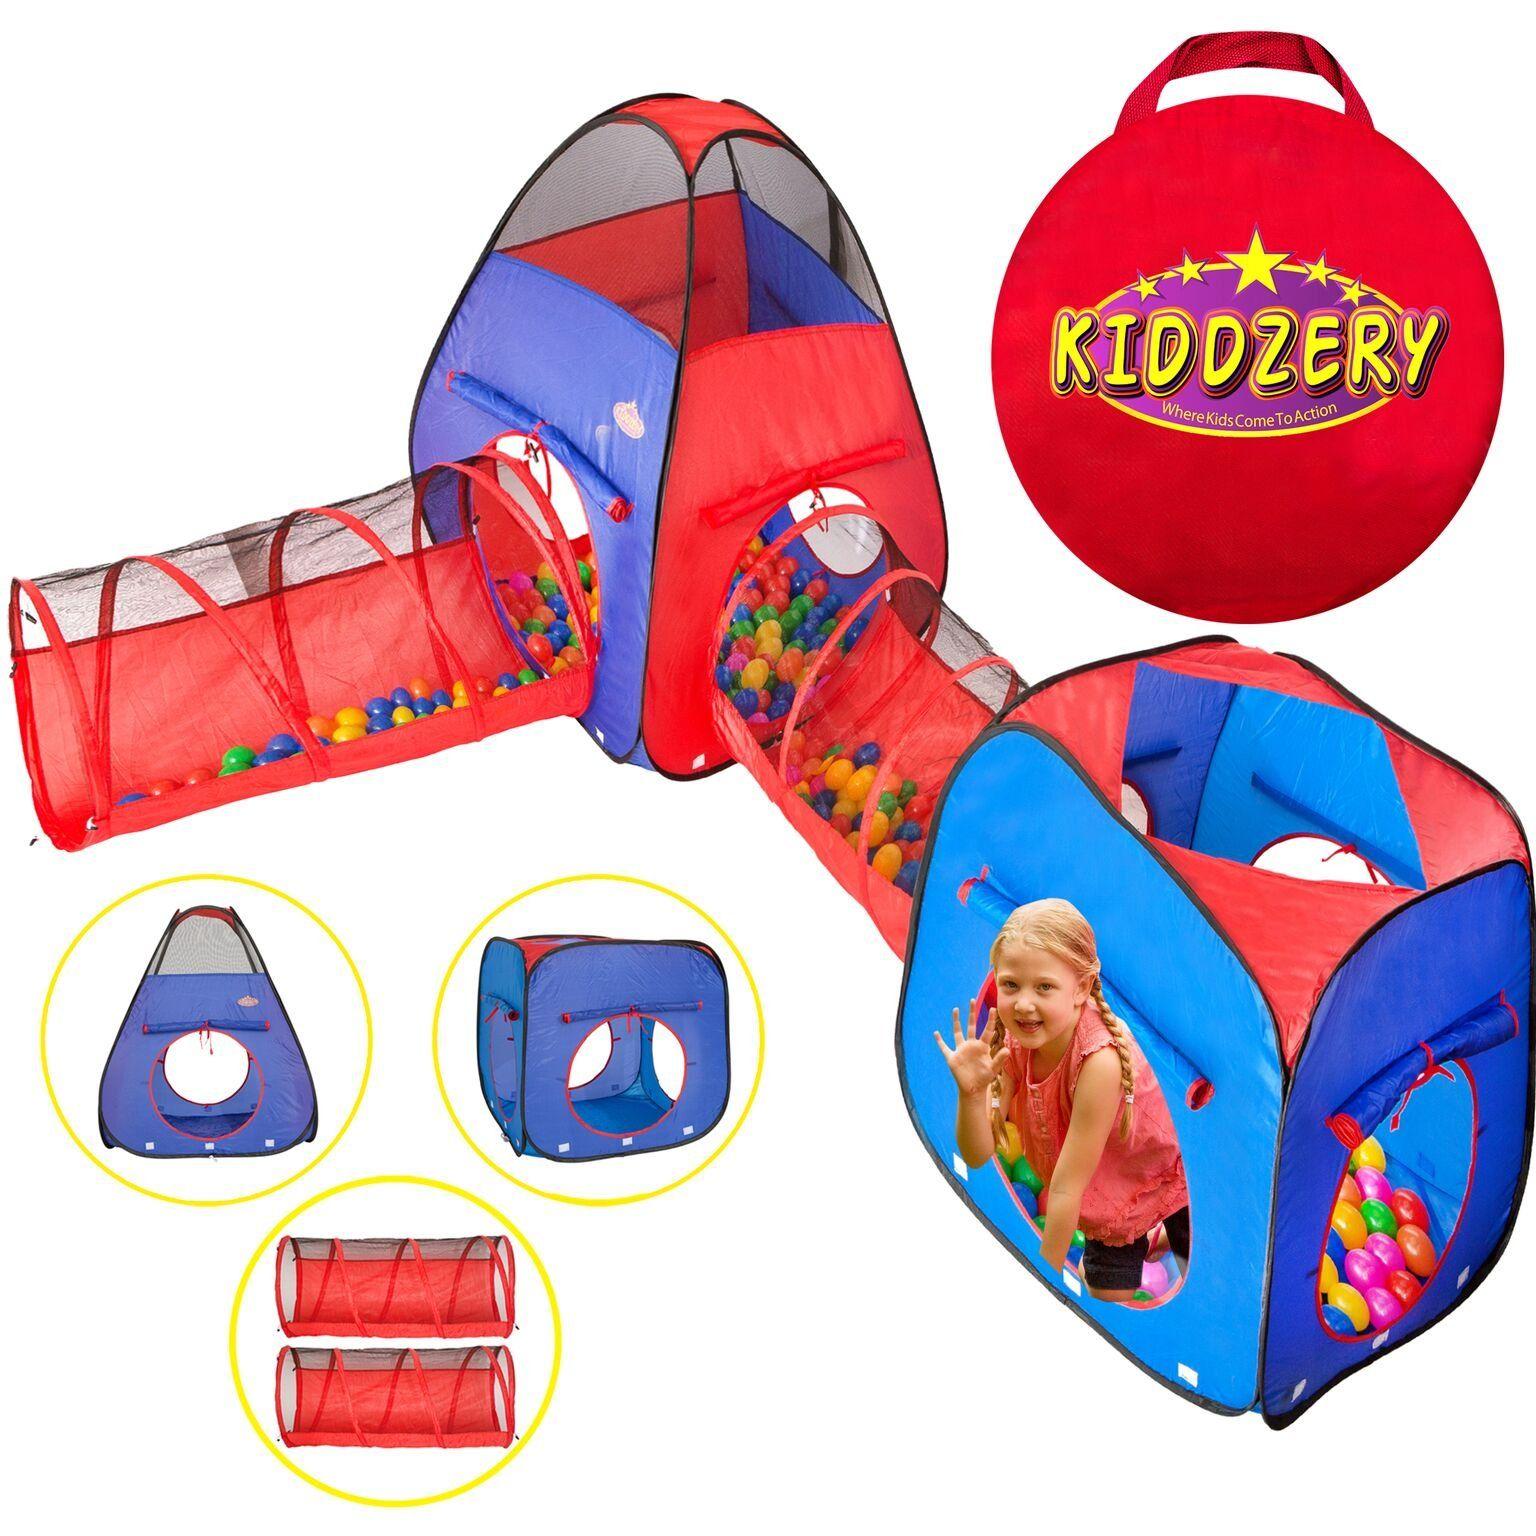 Kiddzery 4pc Kids Play tent Pop Up Ball Pit - 2 Tents + 2 Crawl Tunnels  sc 1 st  Pinterest & Kiddzery 4pc Kids Play tent Pop Up Ball Pit - 2 Tents + 2 Crawl ...